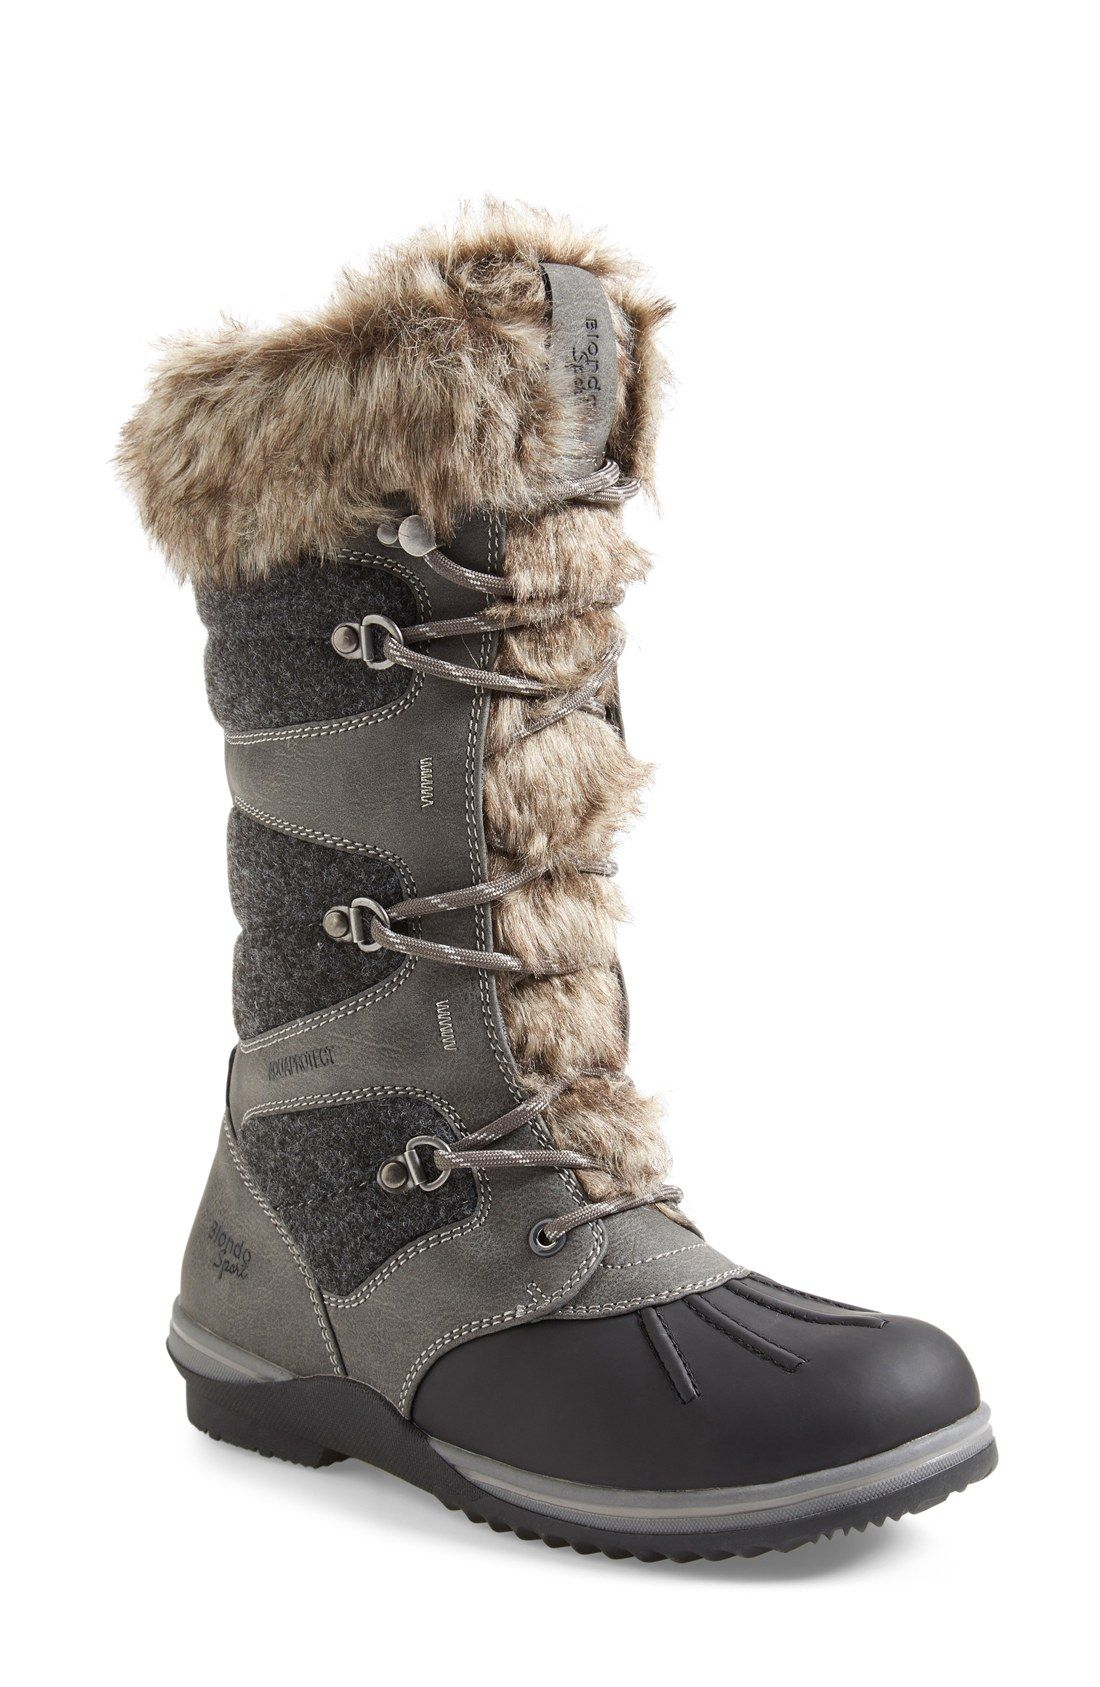 Winter boots women, Waterproof snow boots